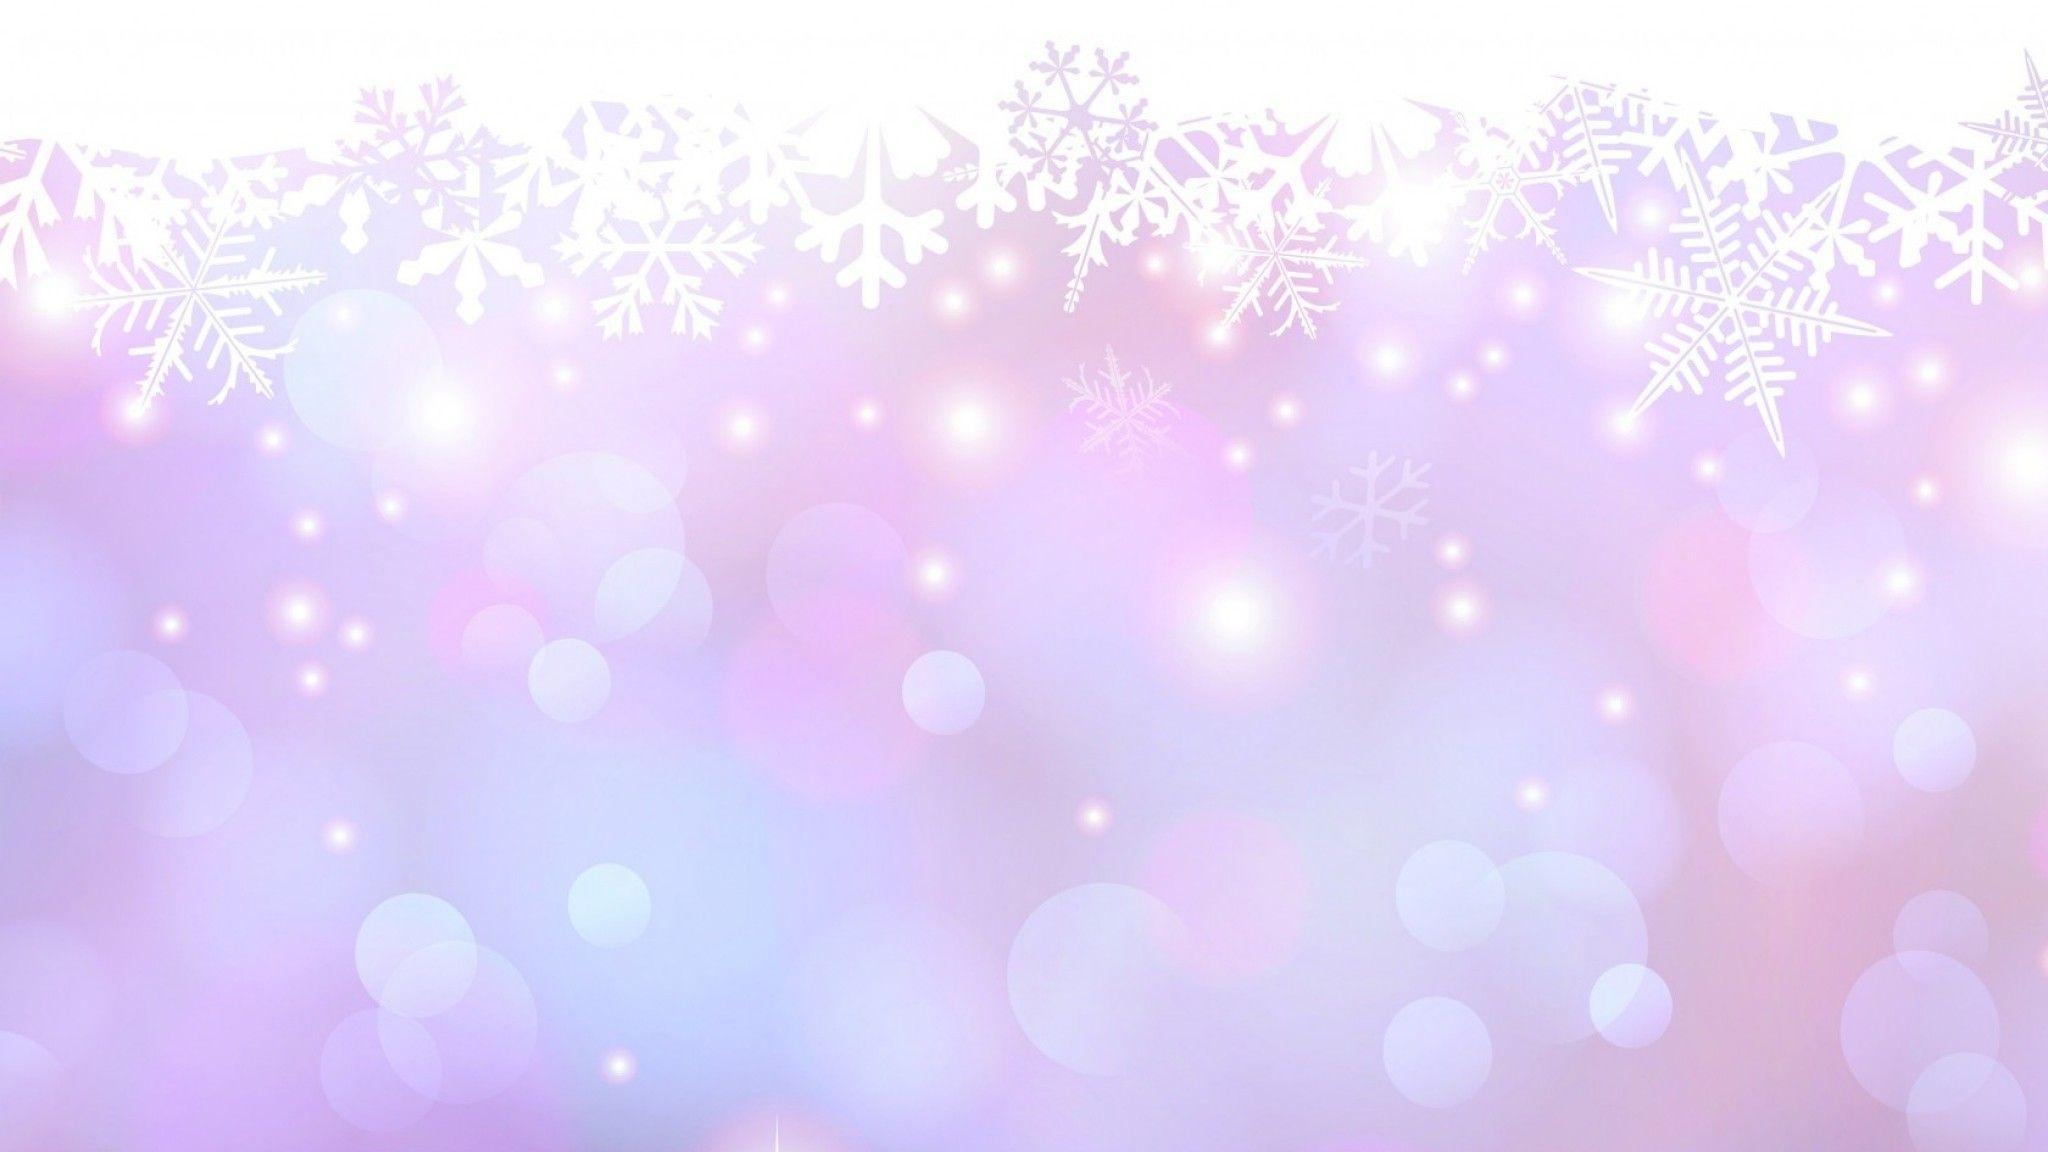 Vaporwave Iphone Wallpaper Purple Pastel Aesthetic Wallpapers Top Free Purple